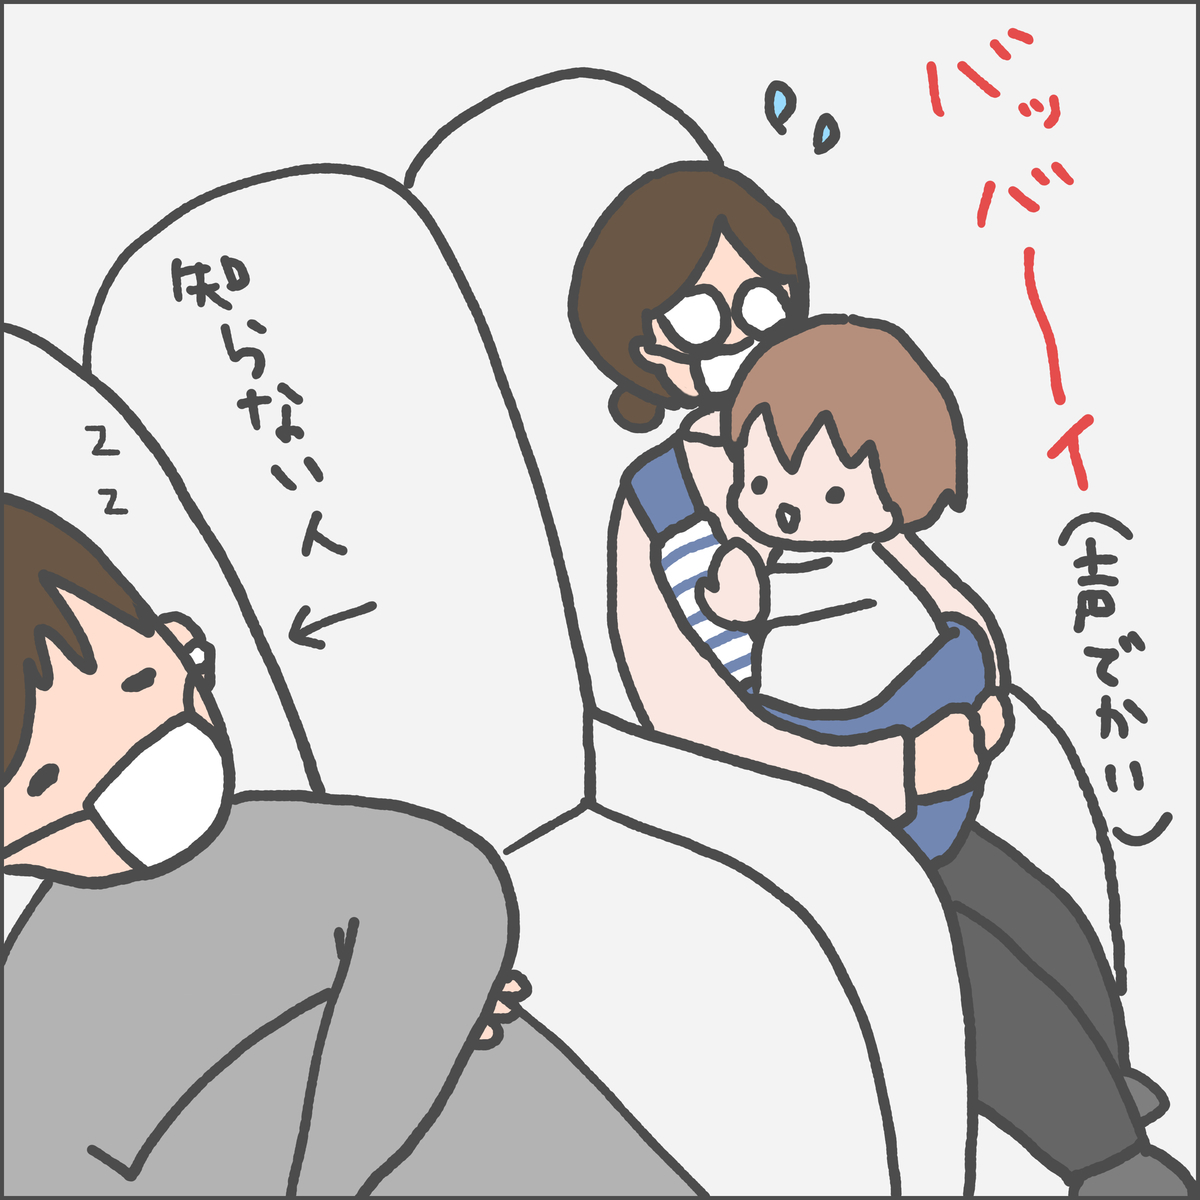 f:id:ika_yoshi:20210429032756j:plain